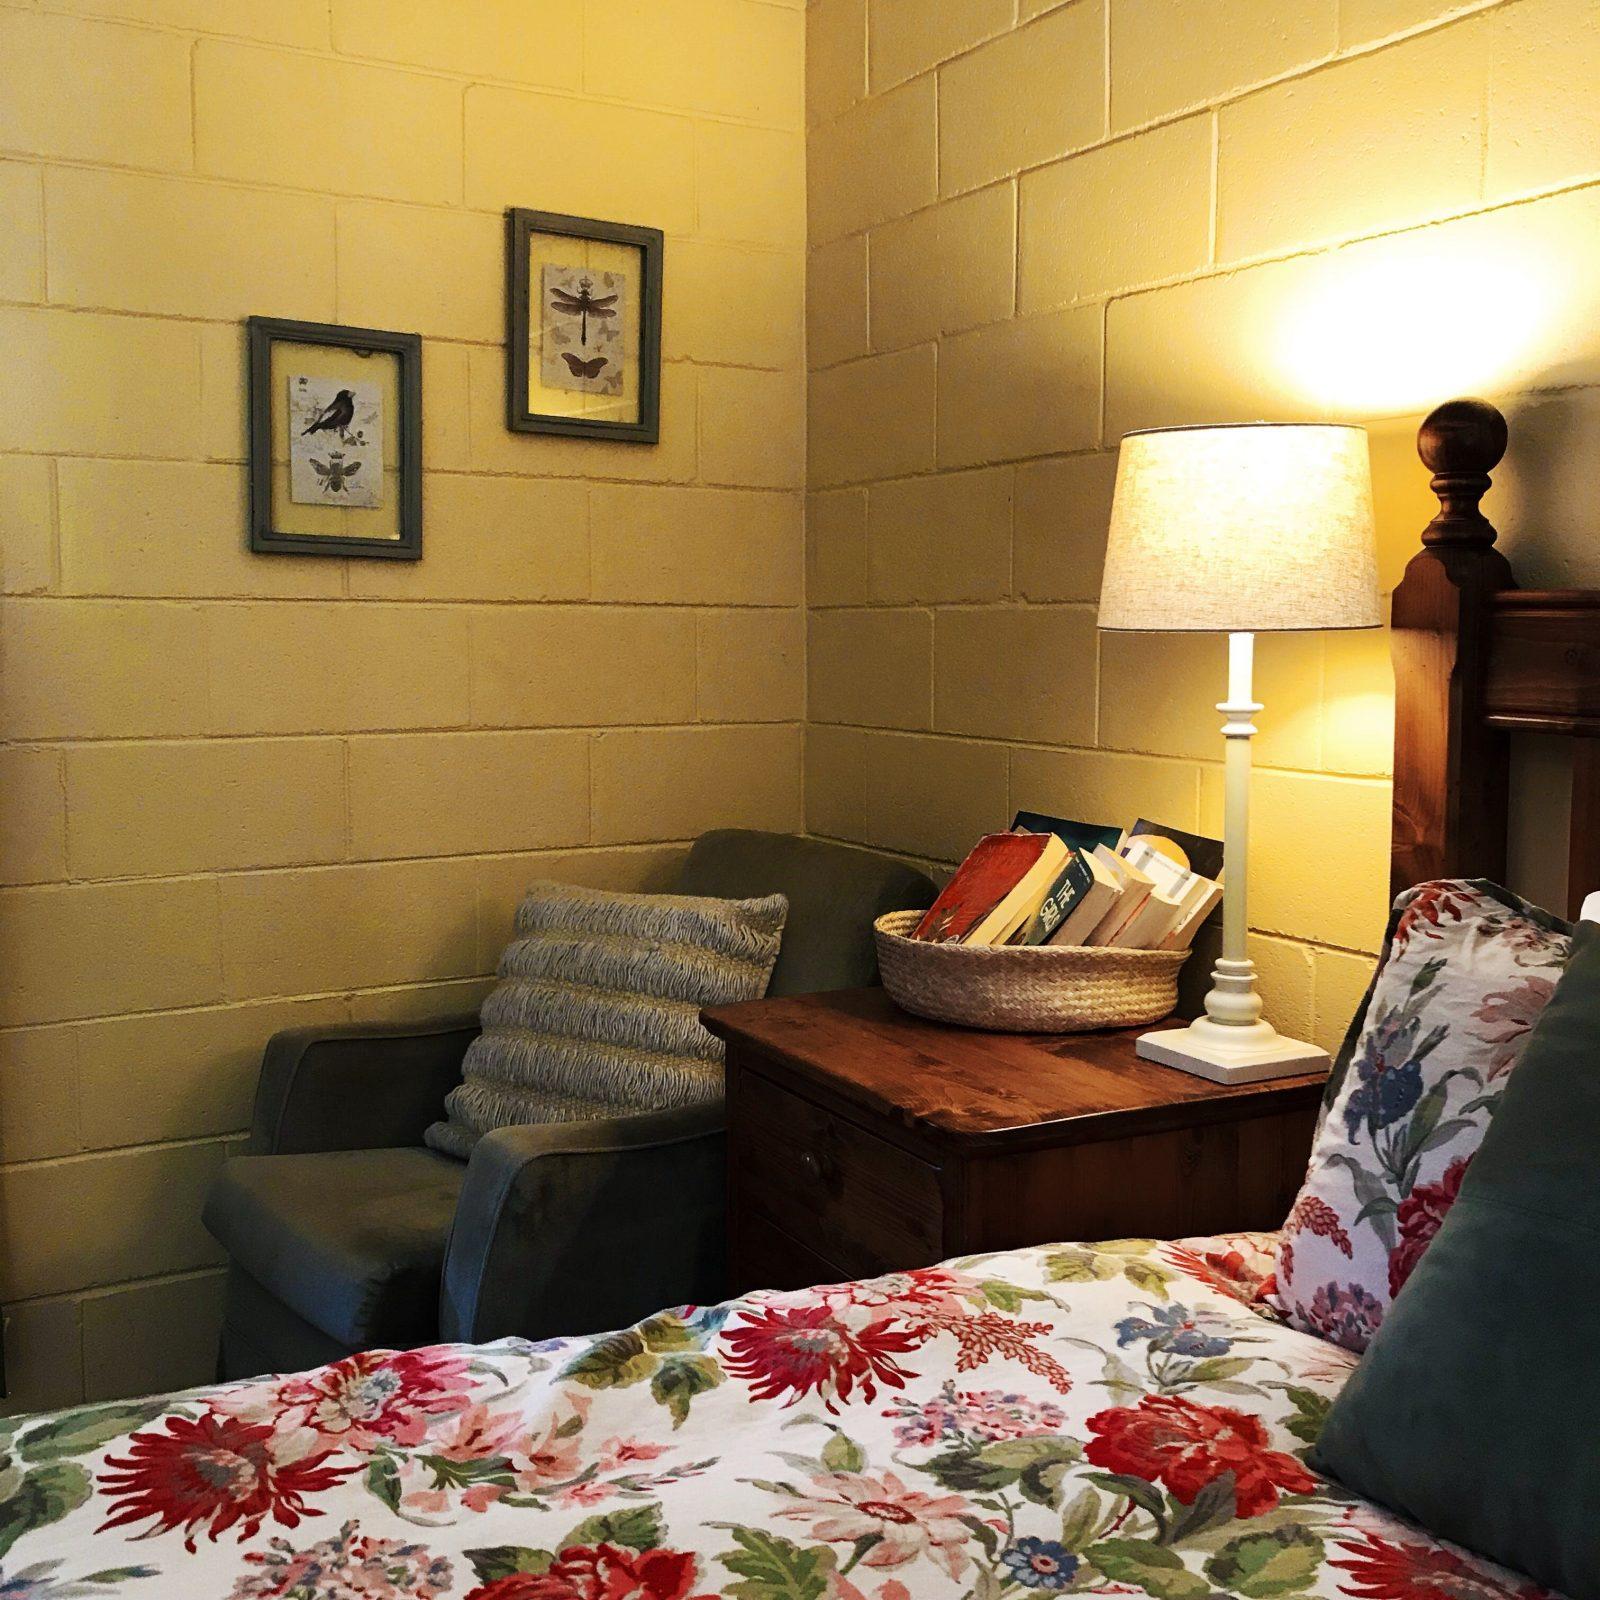 Cosy accommodation.